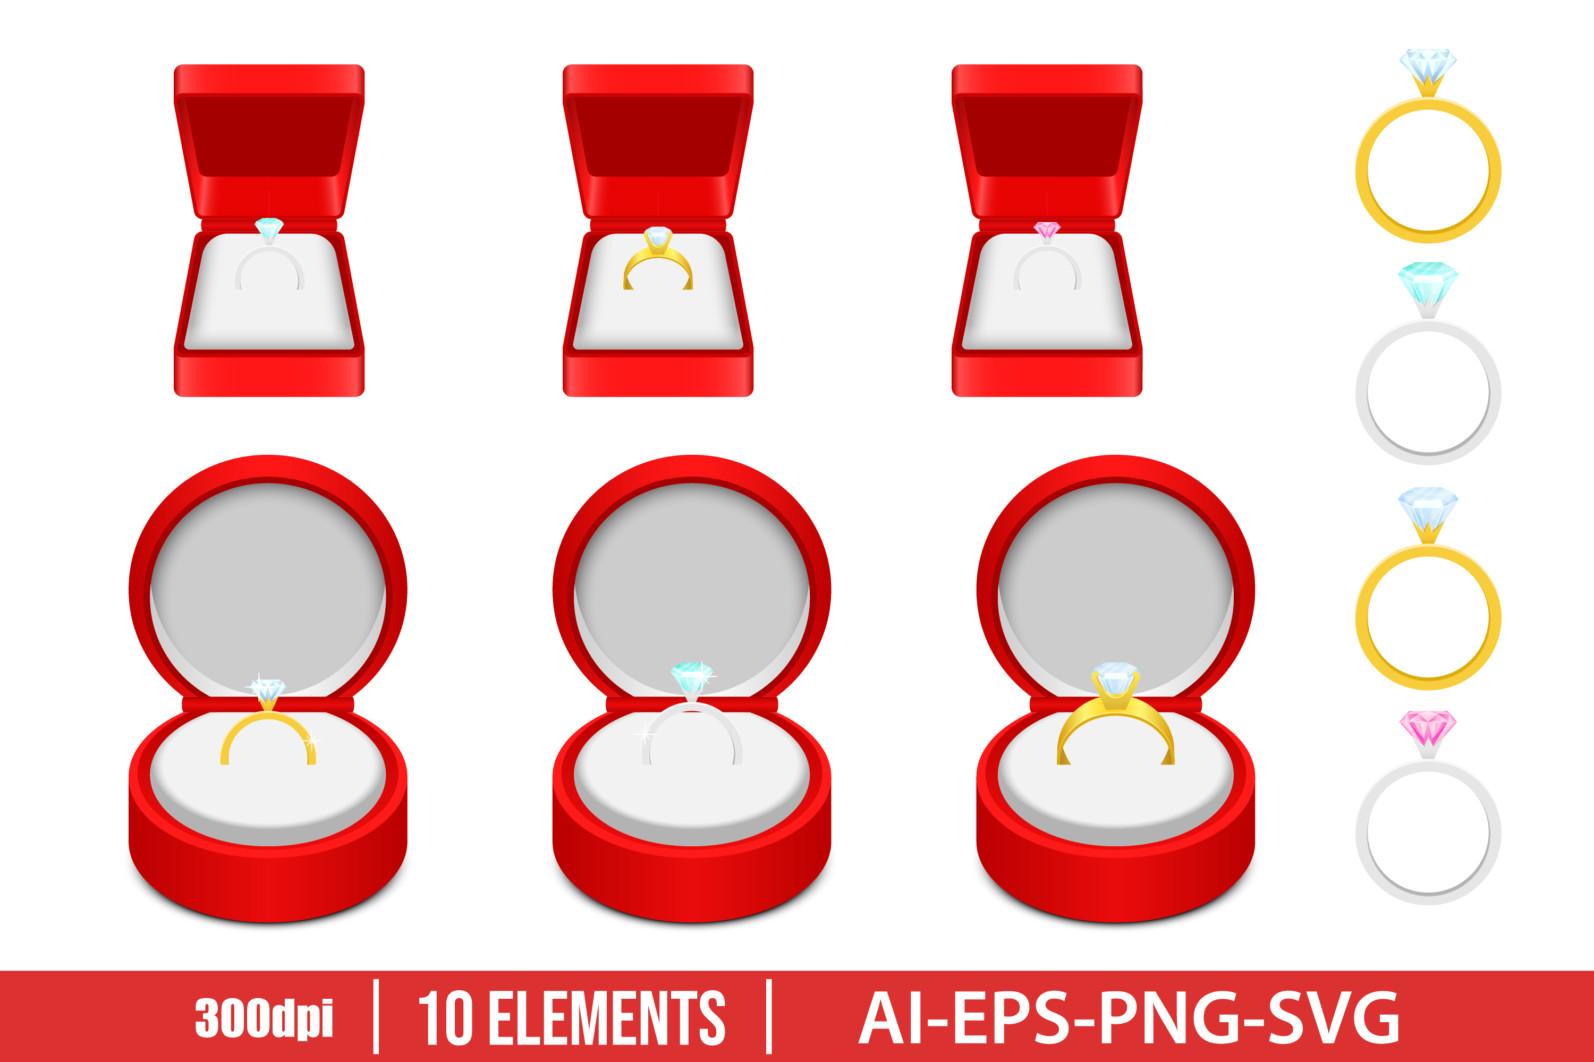 Engagement ring vector design illustration isolated on white background - ENGAGEMENT RING scaled -